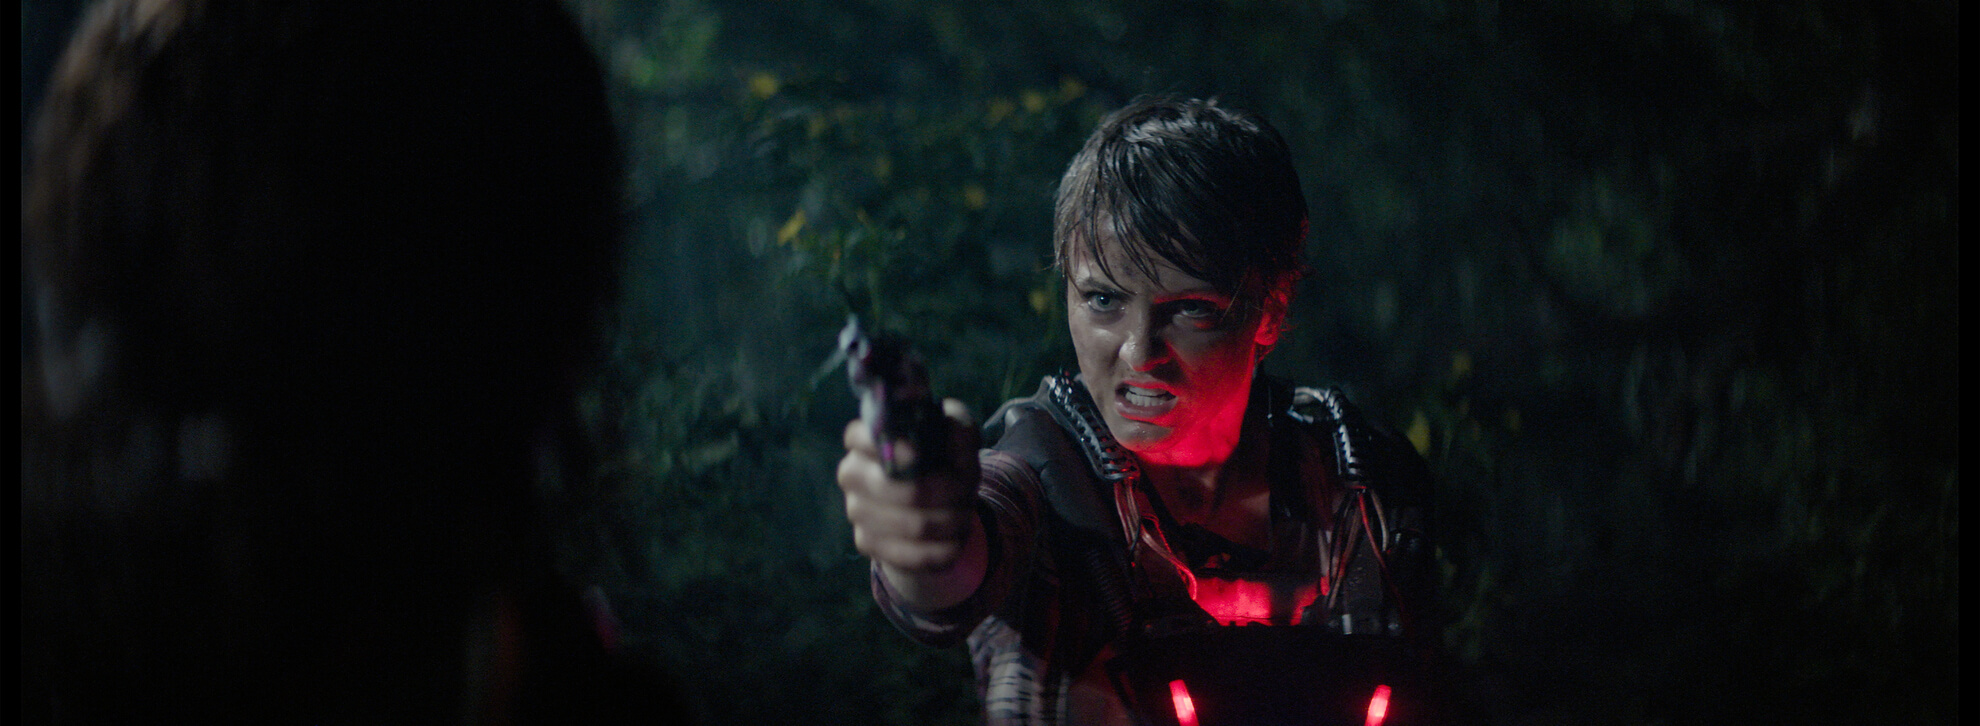 Triggered 2020 Film - Reine Swart in Triggered (2020)